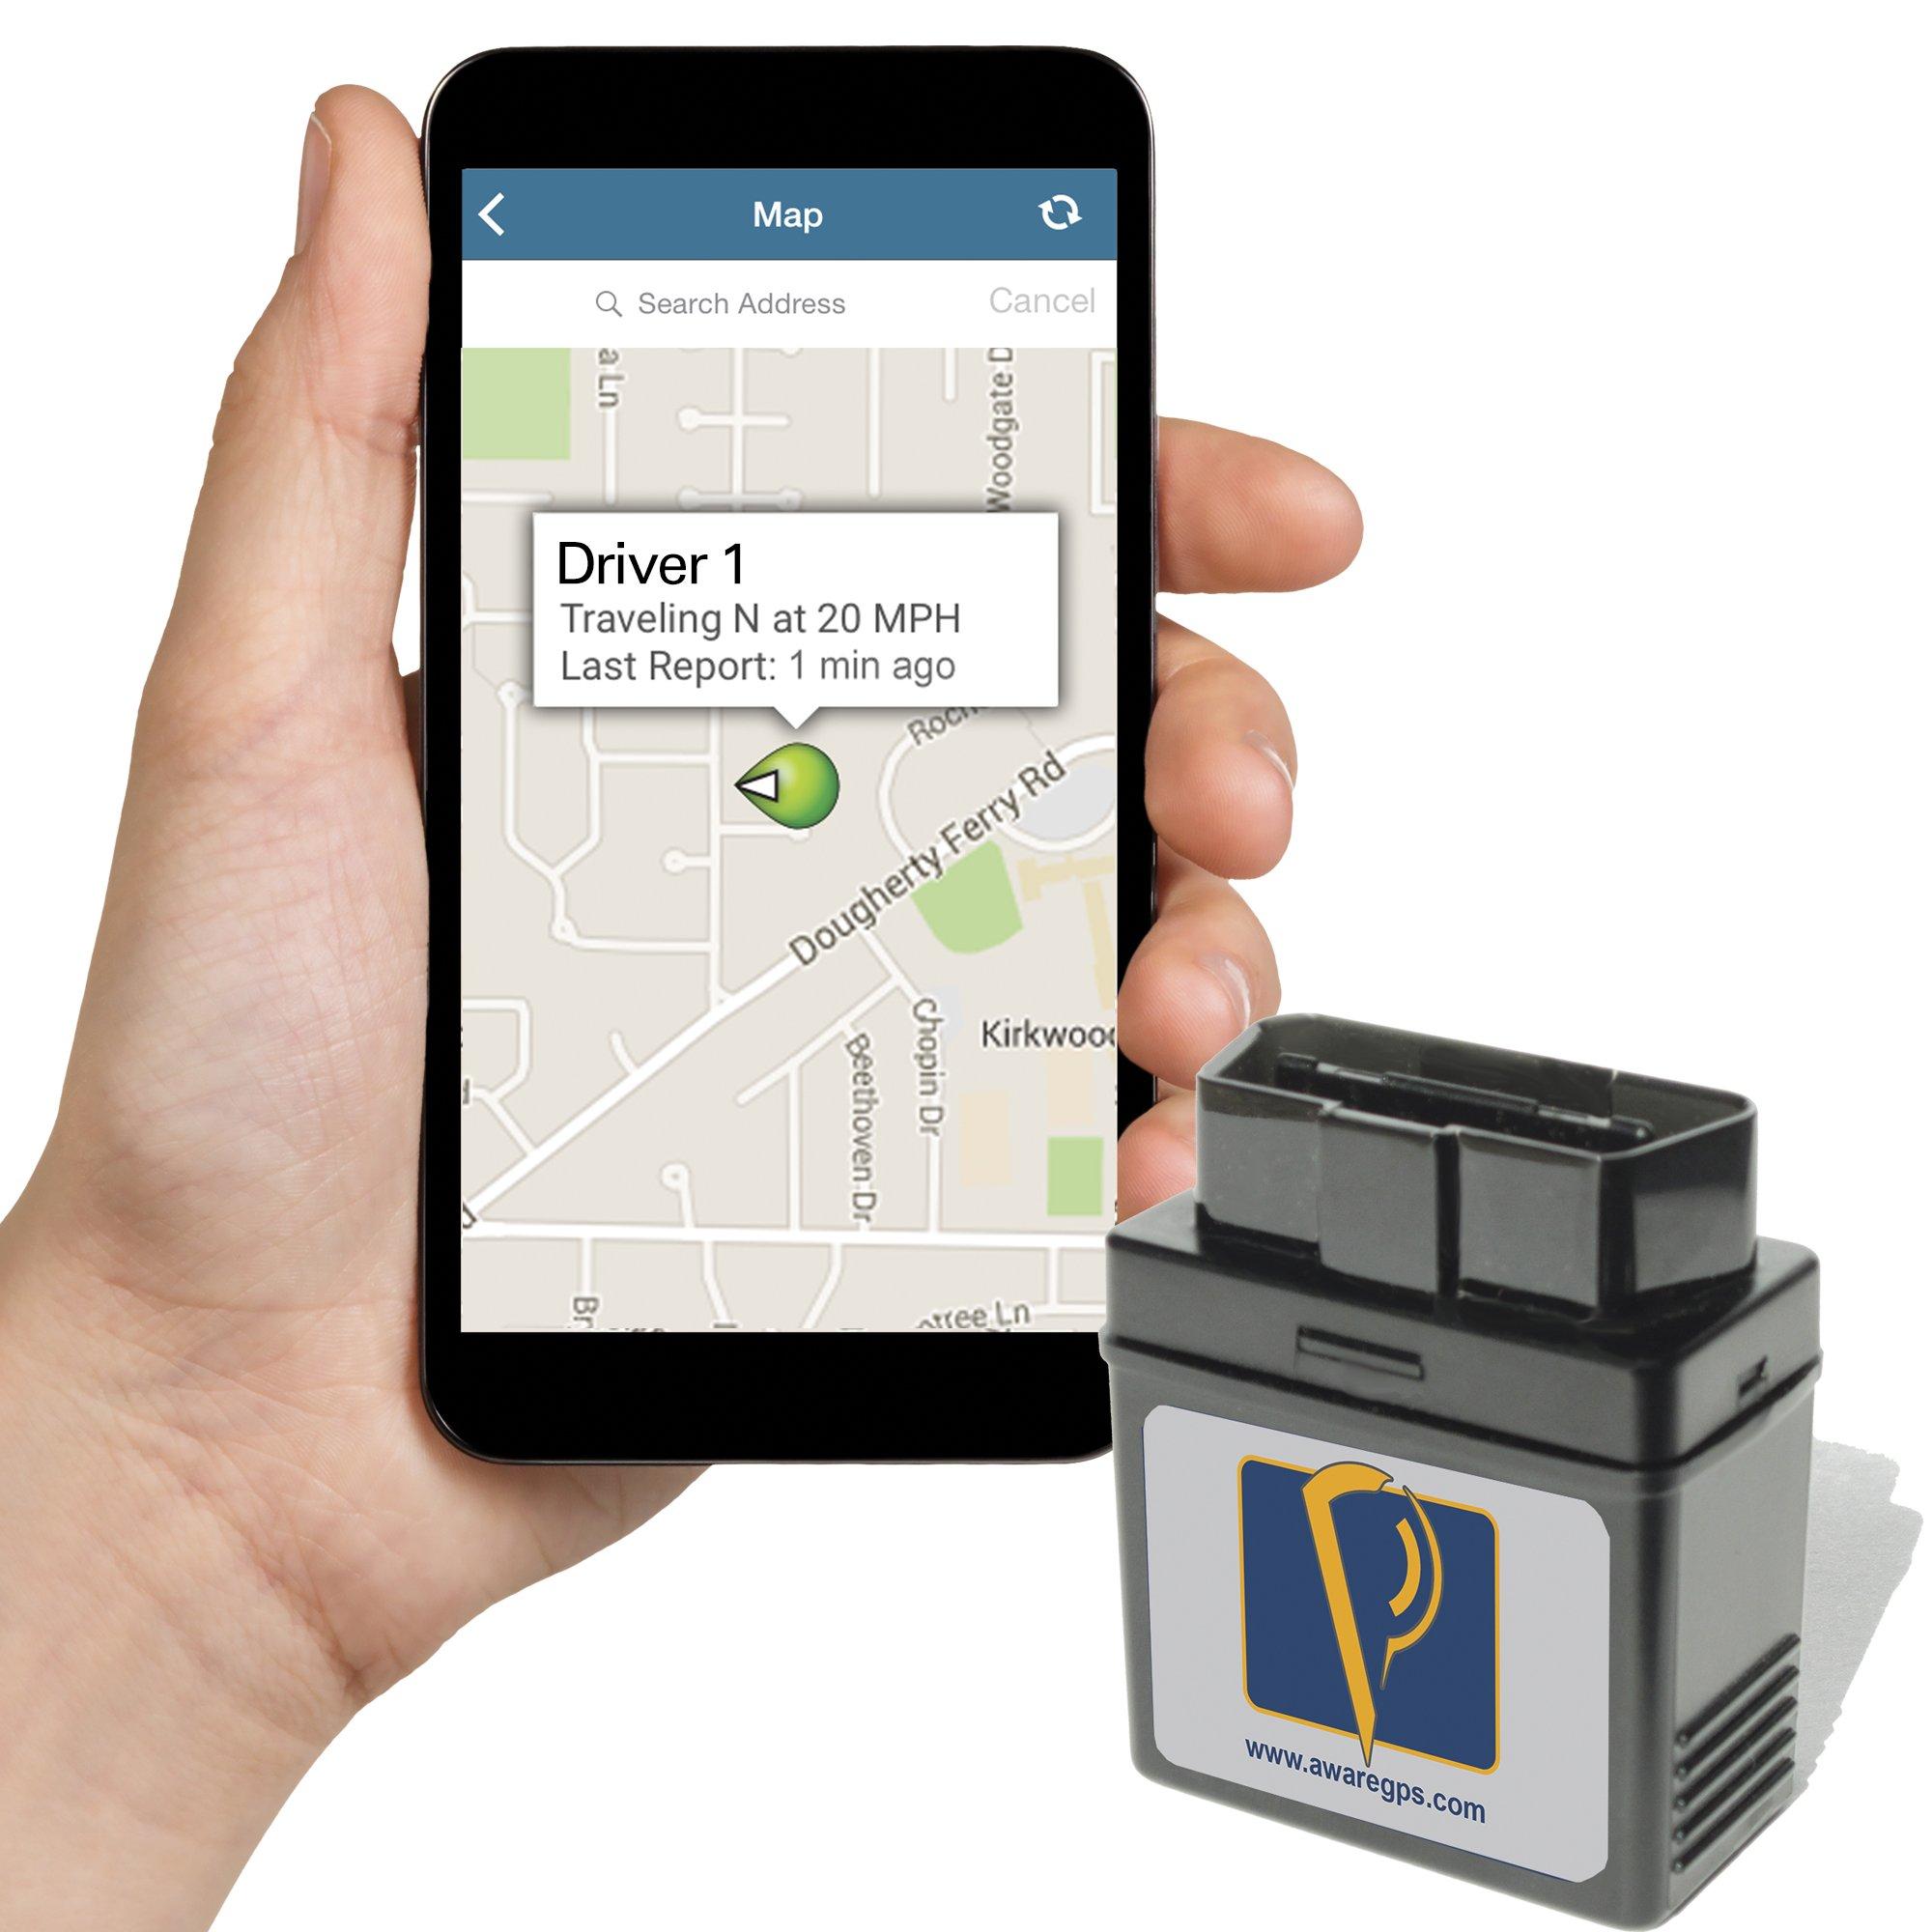 aware gps apvds1 car tracker obd device gps tracking. Black Bedroom Furniture Sets. Home Design Ideas